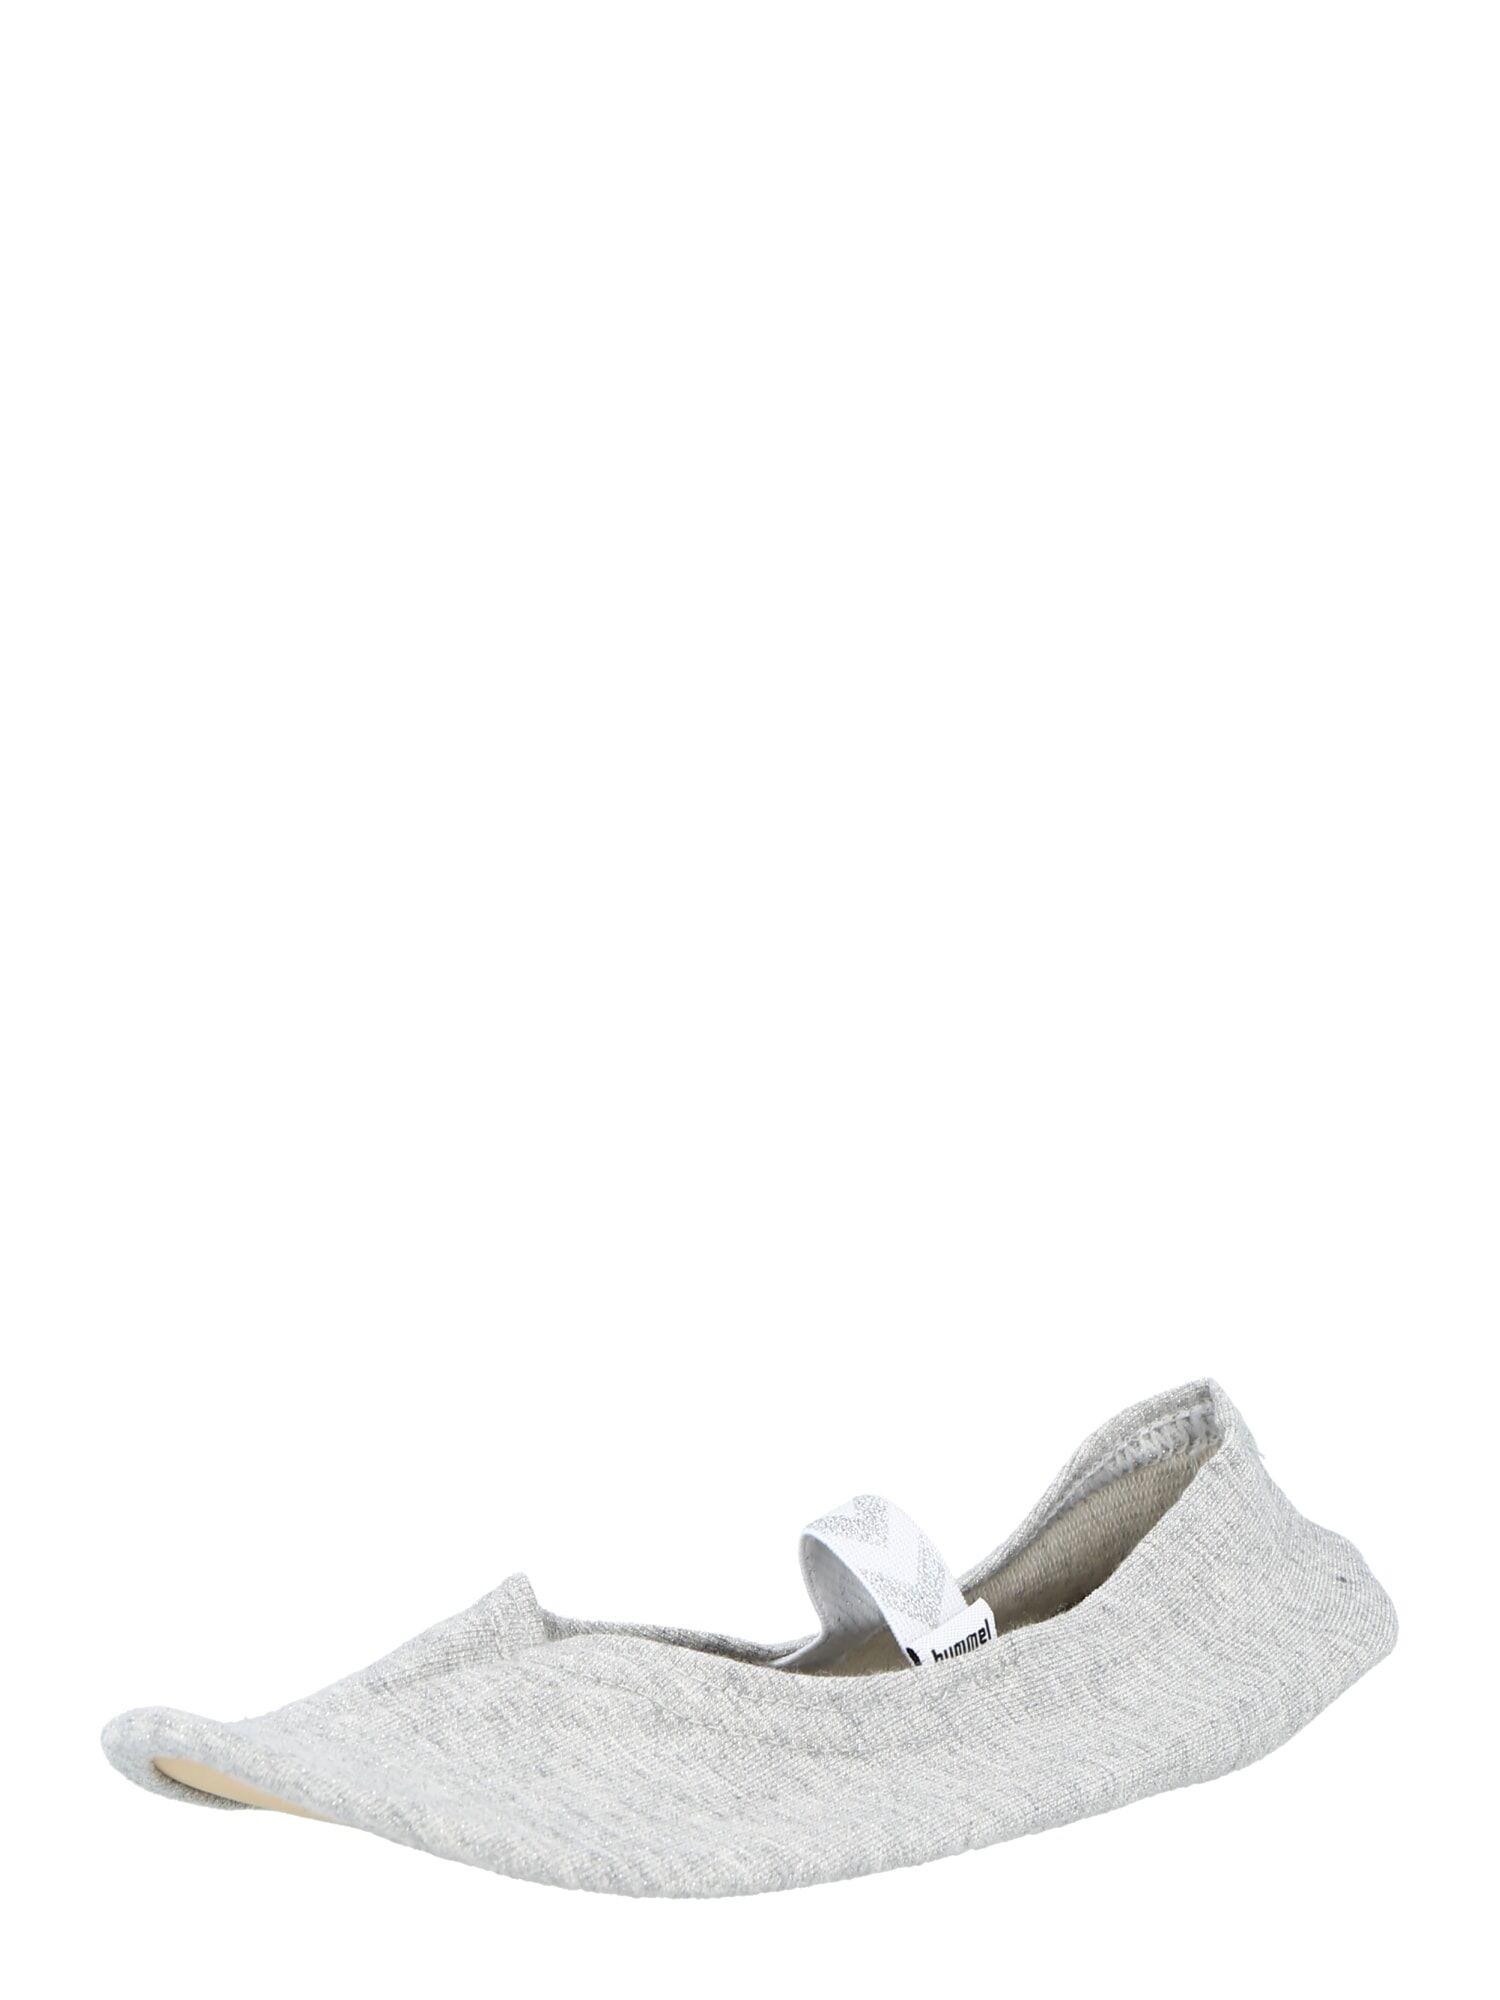 Hummel Chaussure de sport  - Gris - Taille: 24 - boy